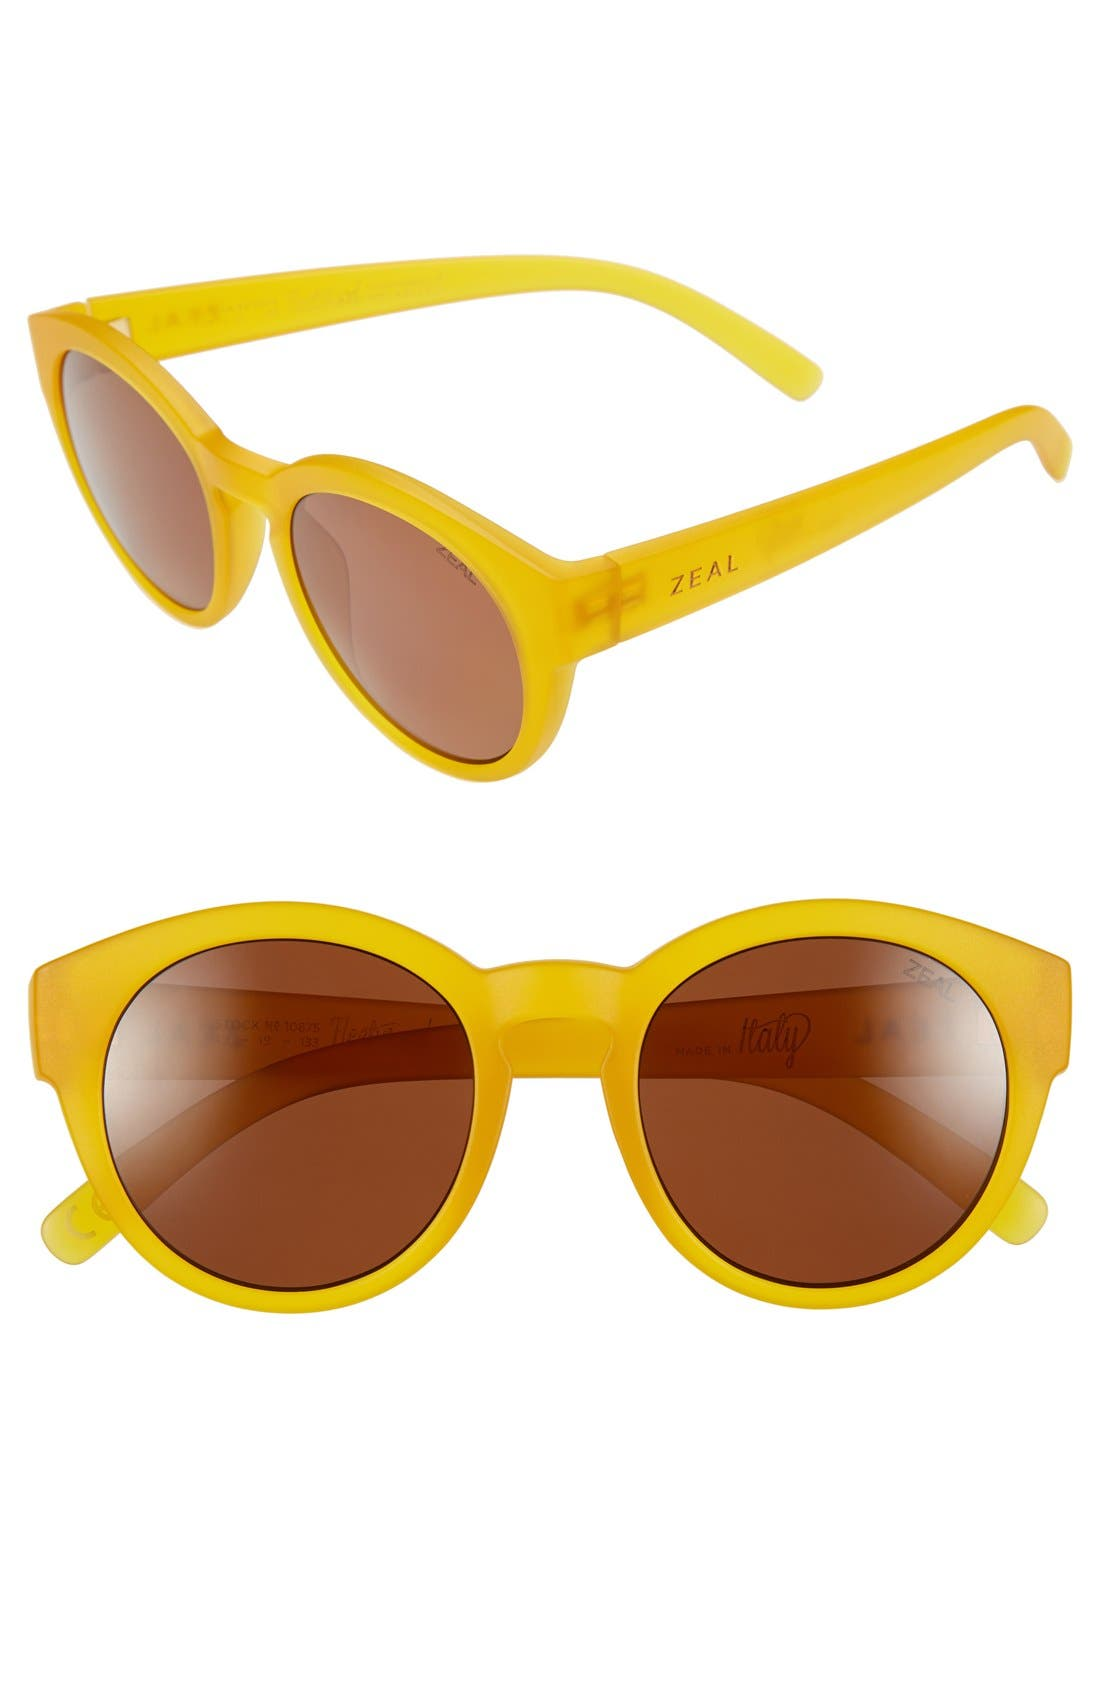 Main Image - Zeal Optics 49mm Biodegradable Plant Based Round Sunglasses